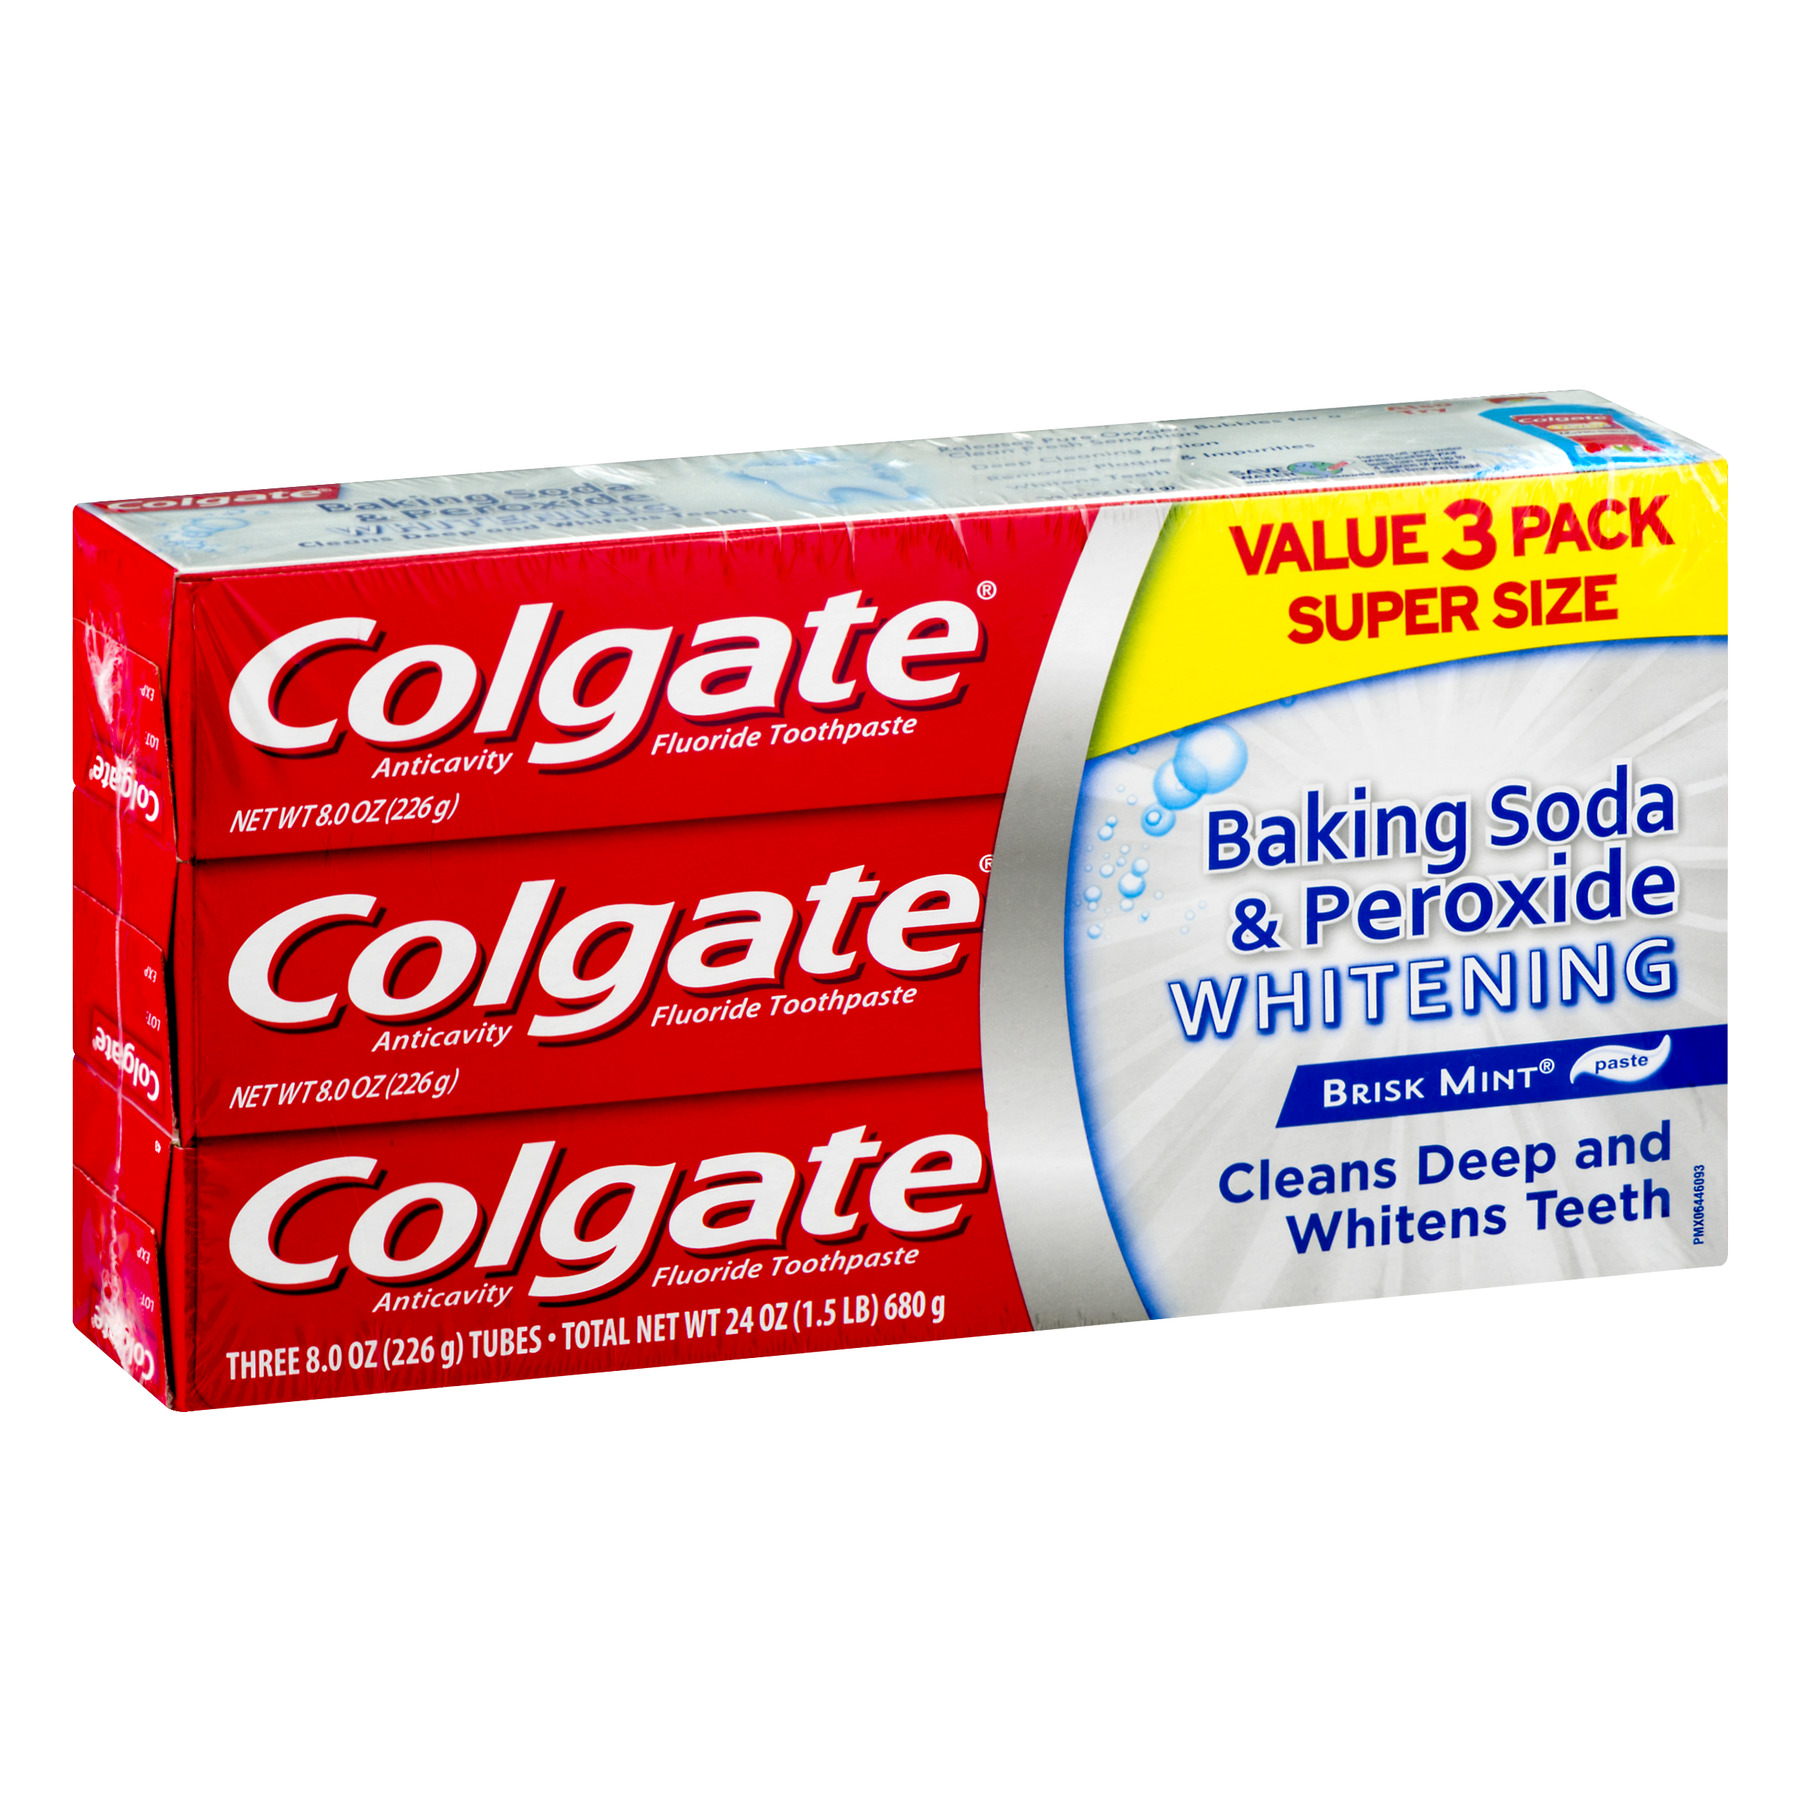 Colgate Baking Soda And Peroxide Whitening Toothpaste 8 Oz 3